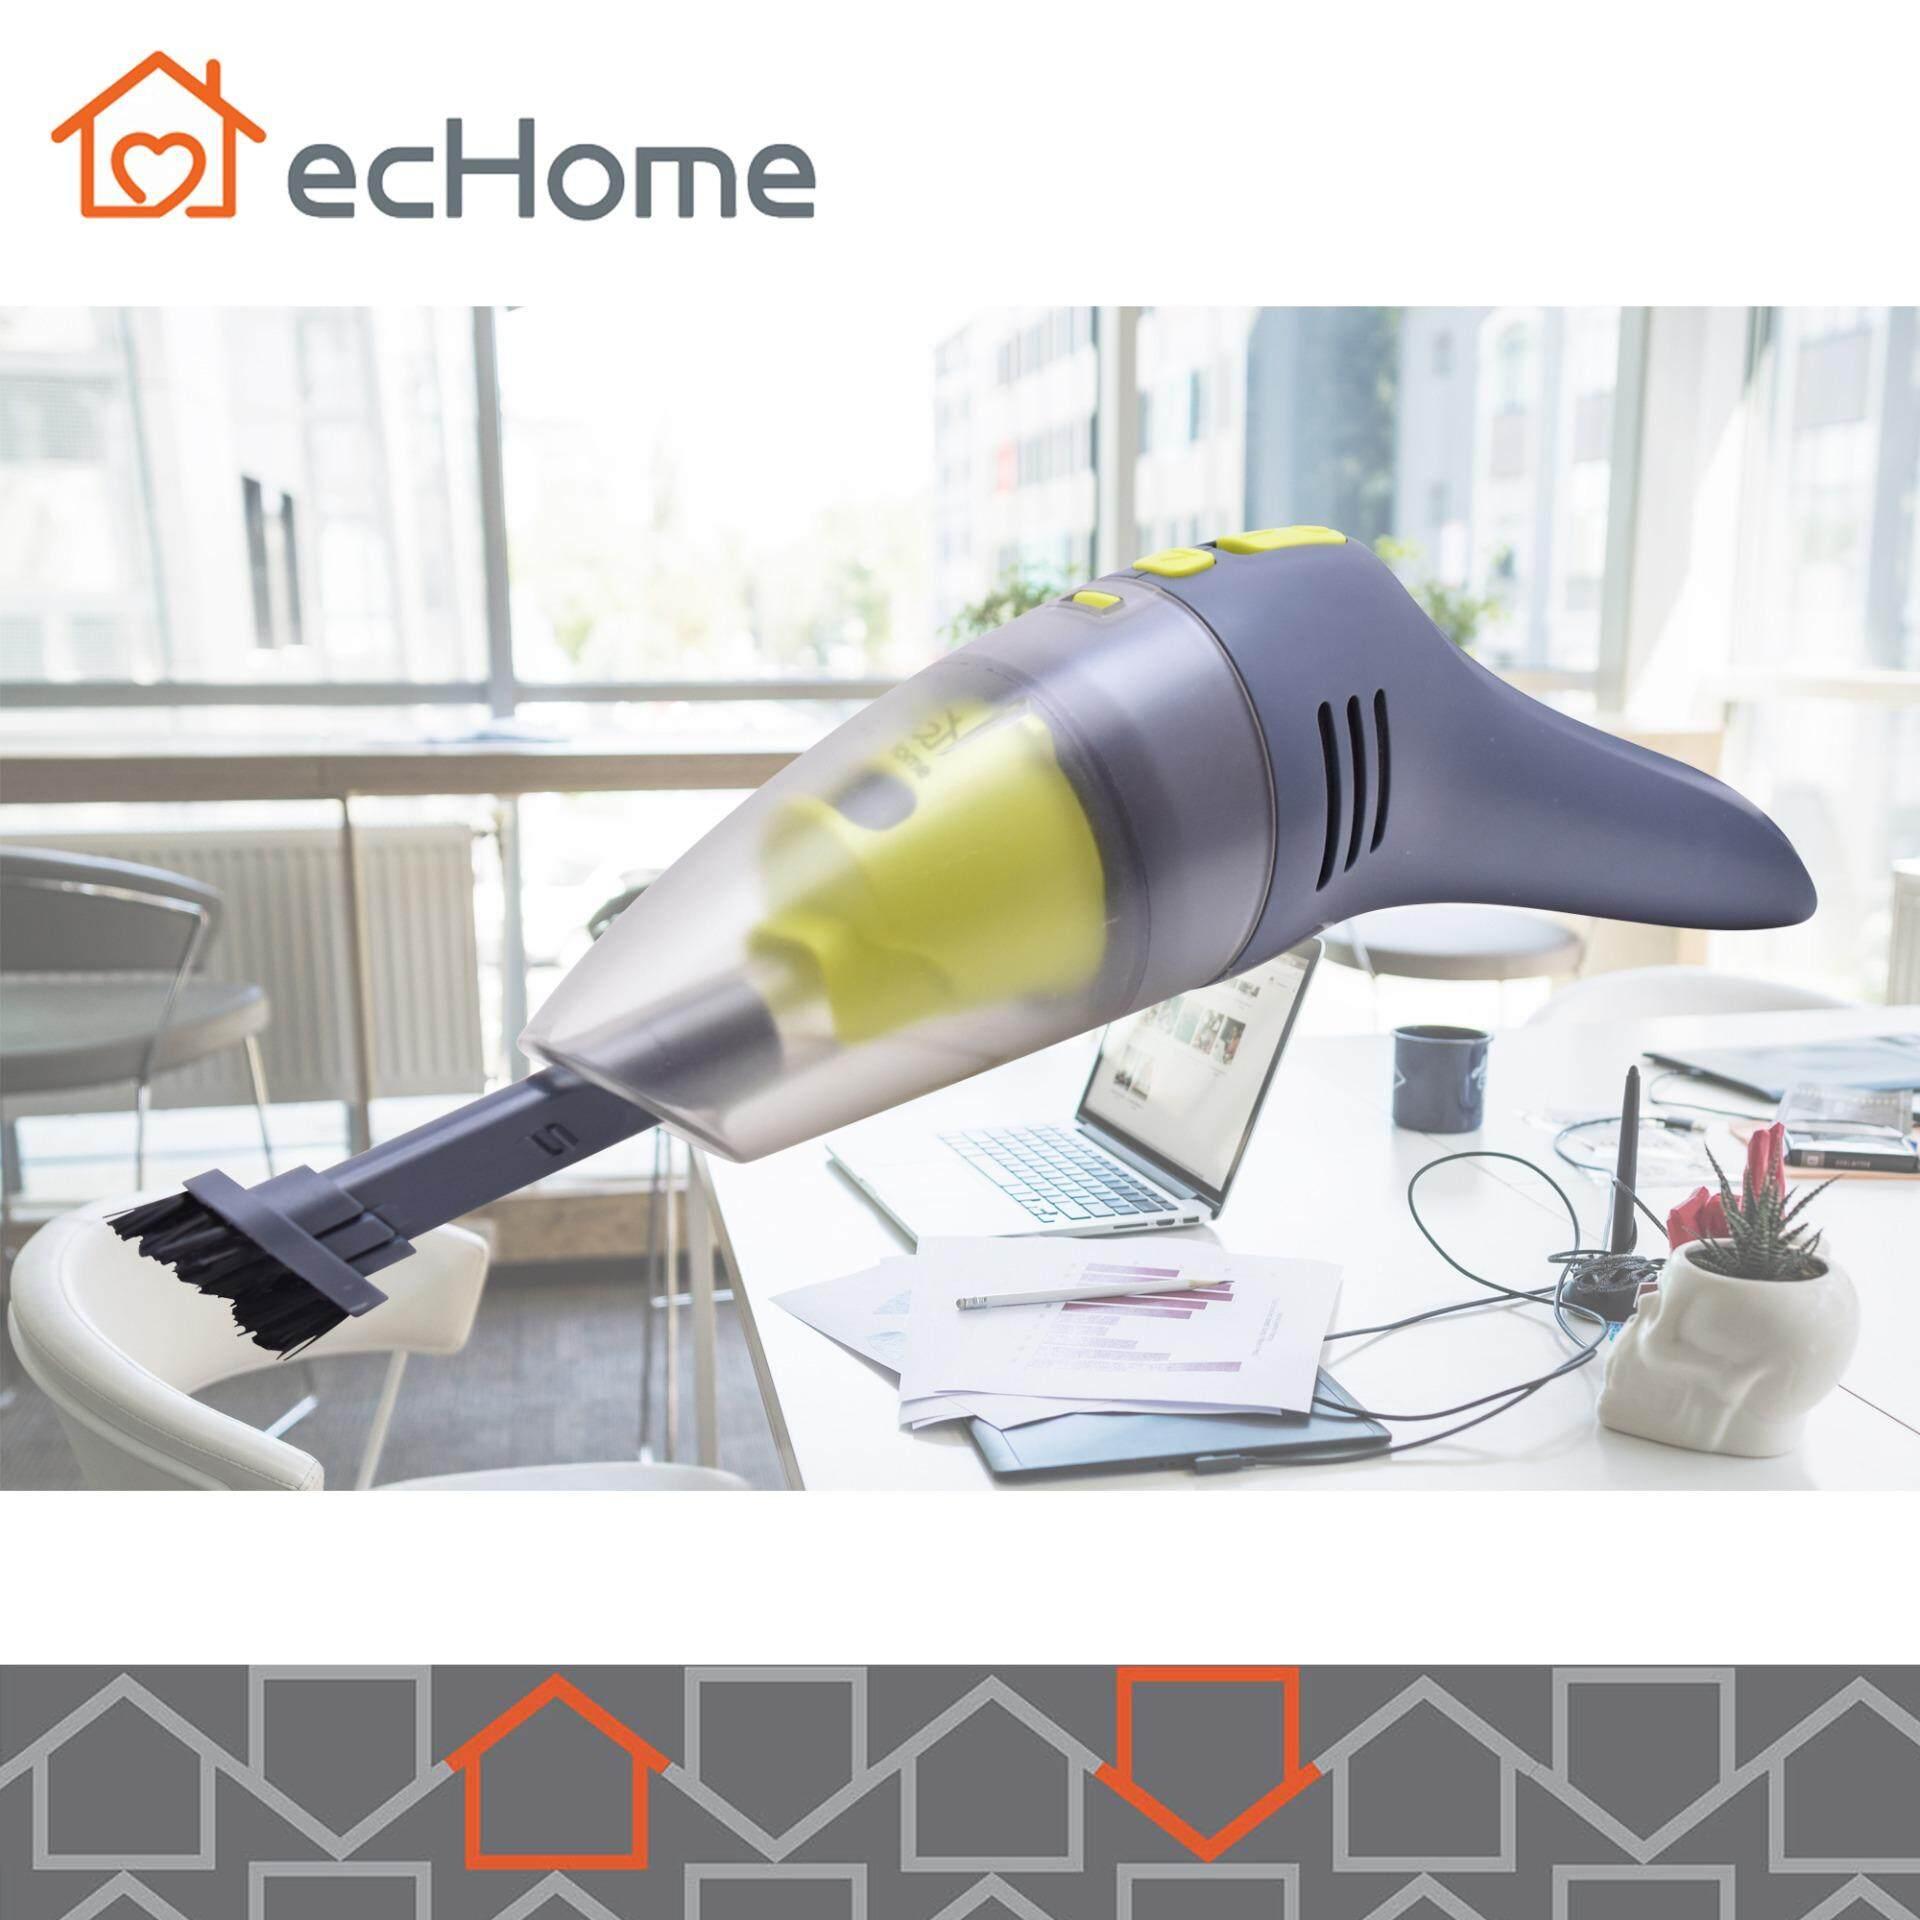 Features Echome Handheld Mini Vacuum Cleaner Usb Rechargeable Cordless Bagless Portable Car Desktop Computer